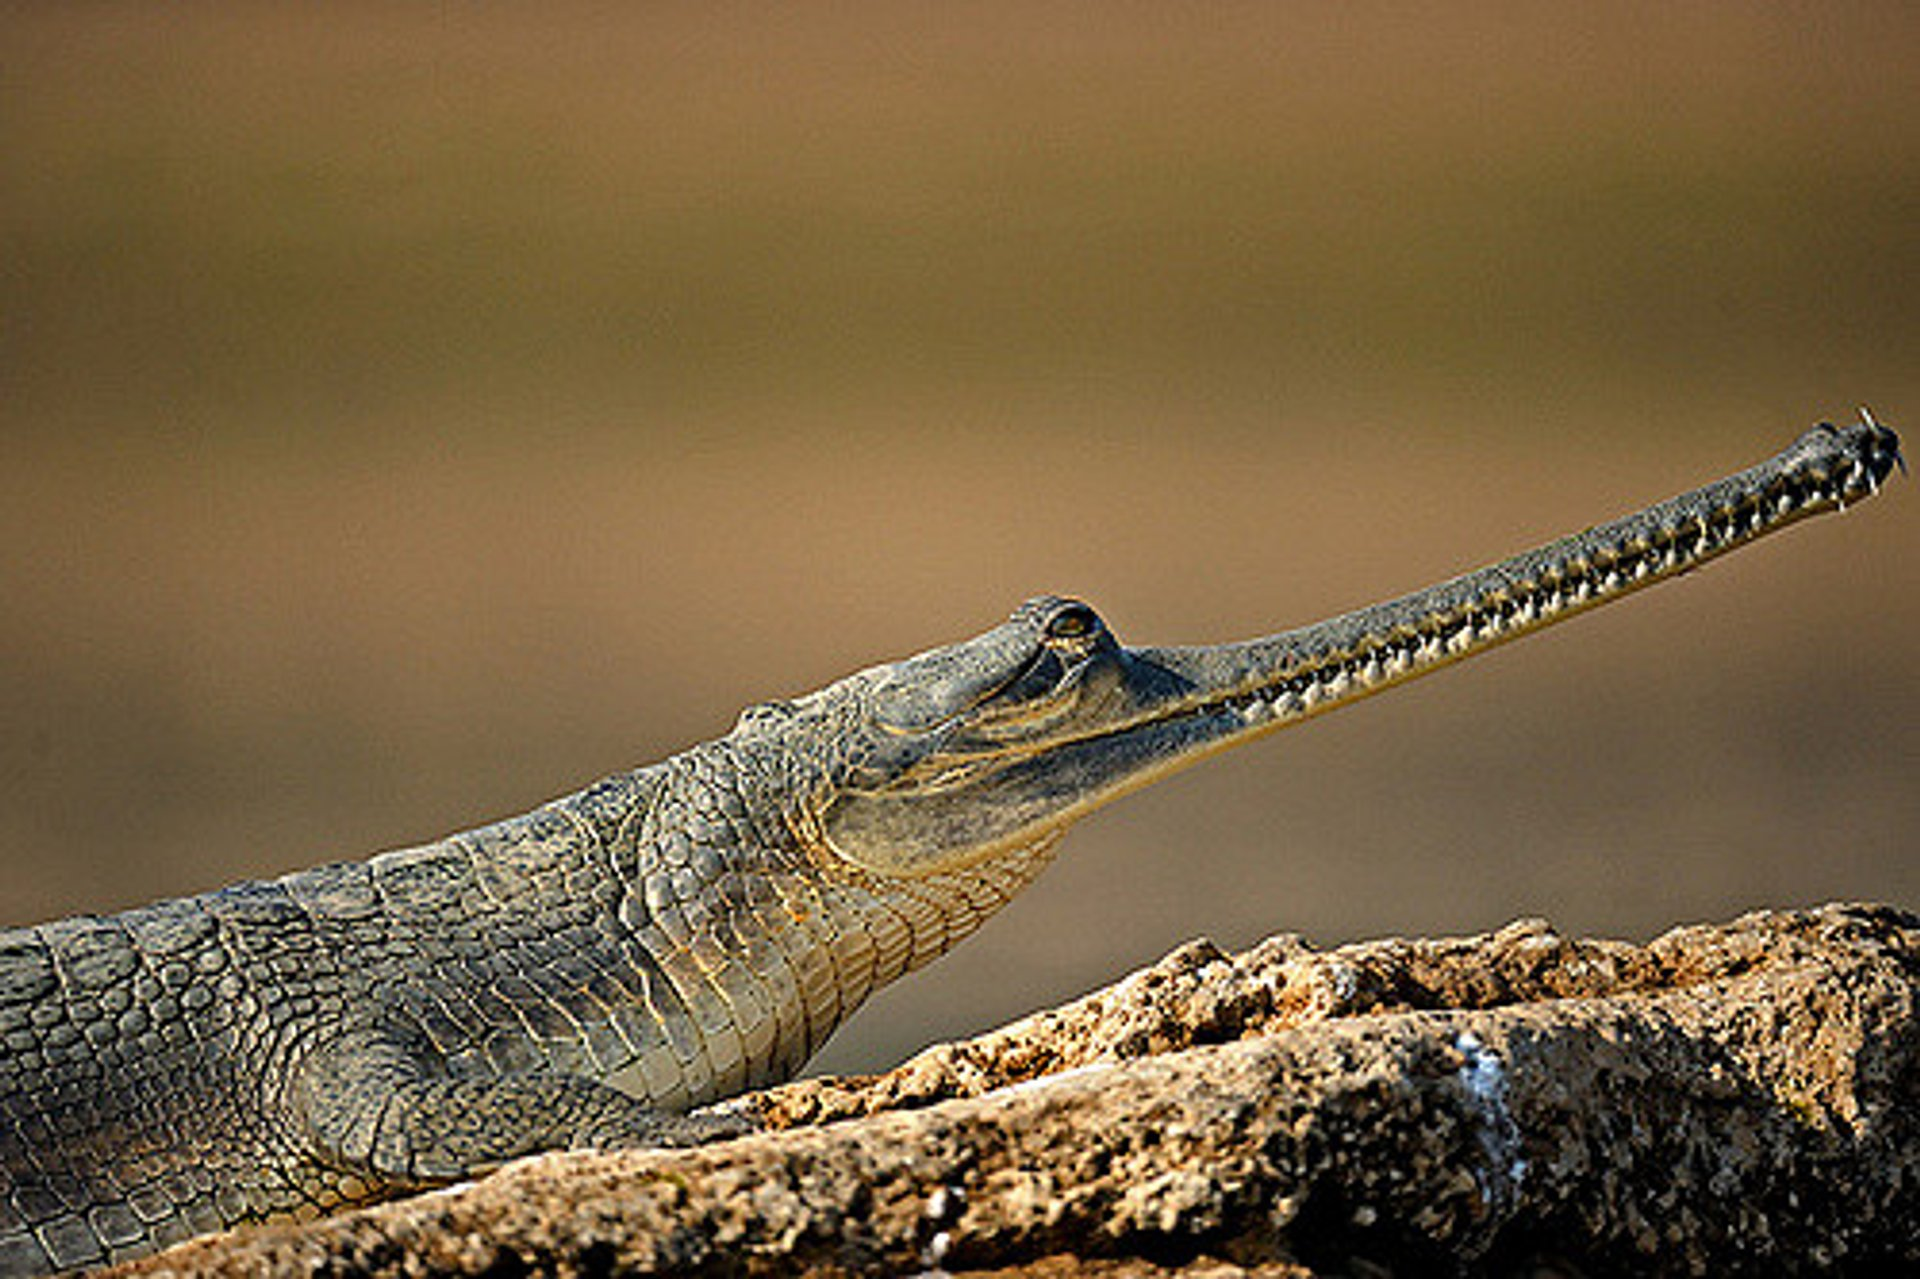 Gharial (alligator) 2020